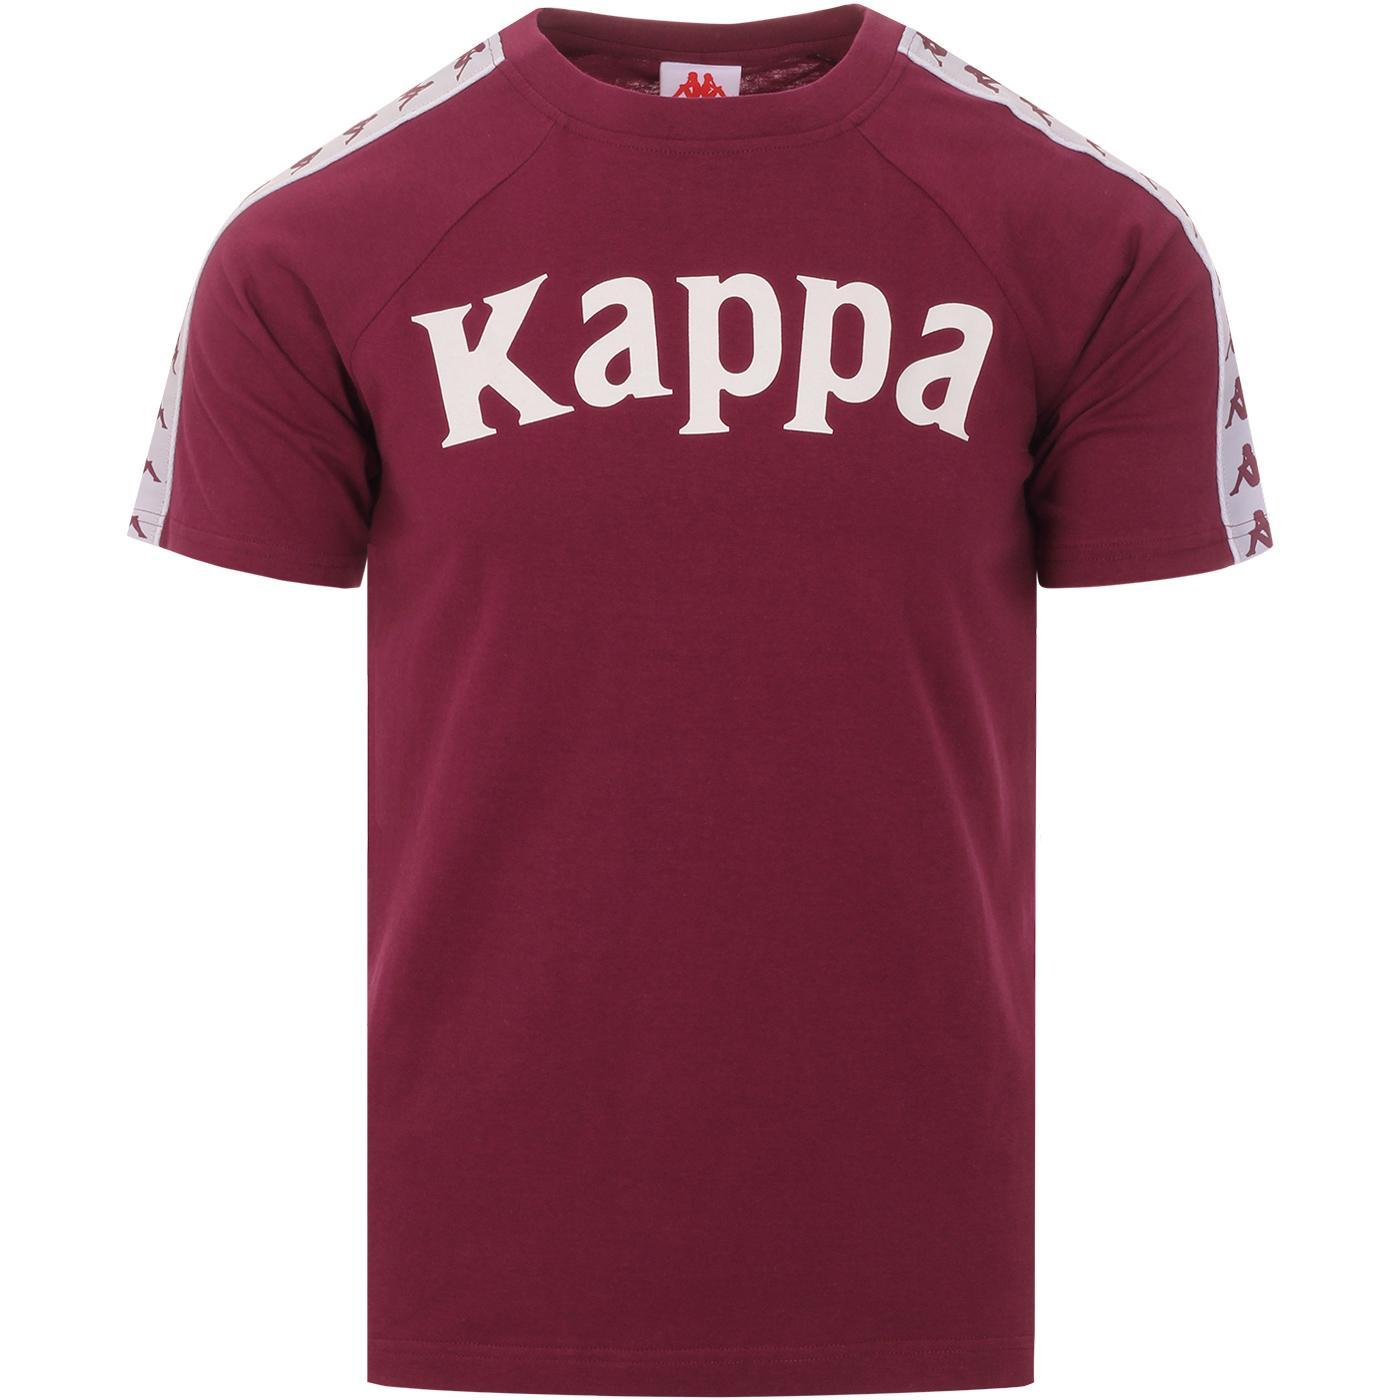 Balima KAPPA Retro 222 Banda Taped Sleeve Logo Tee